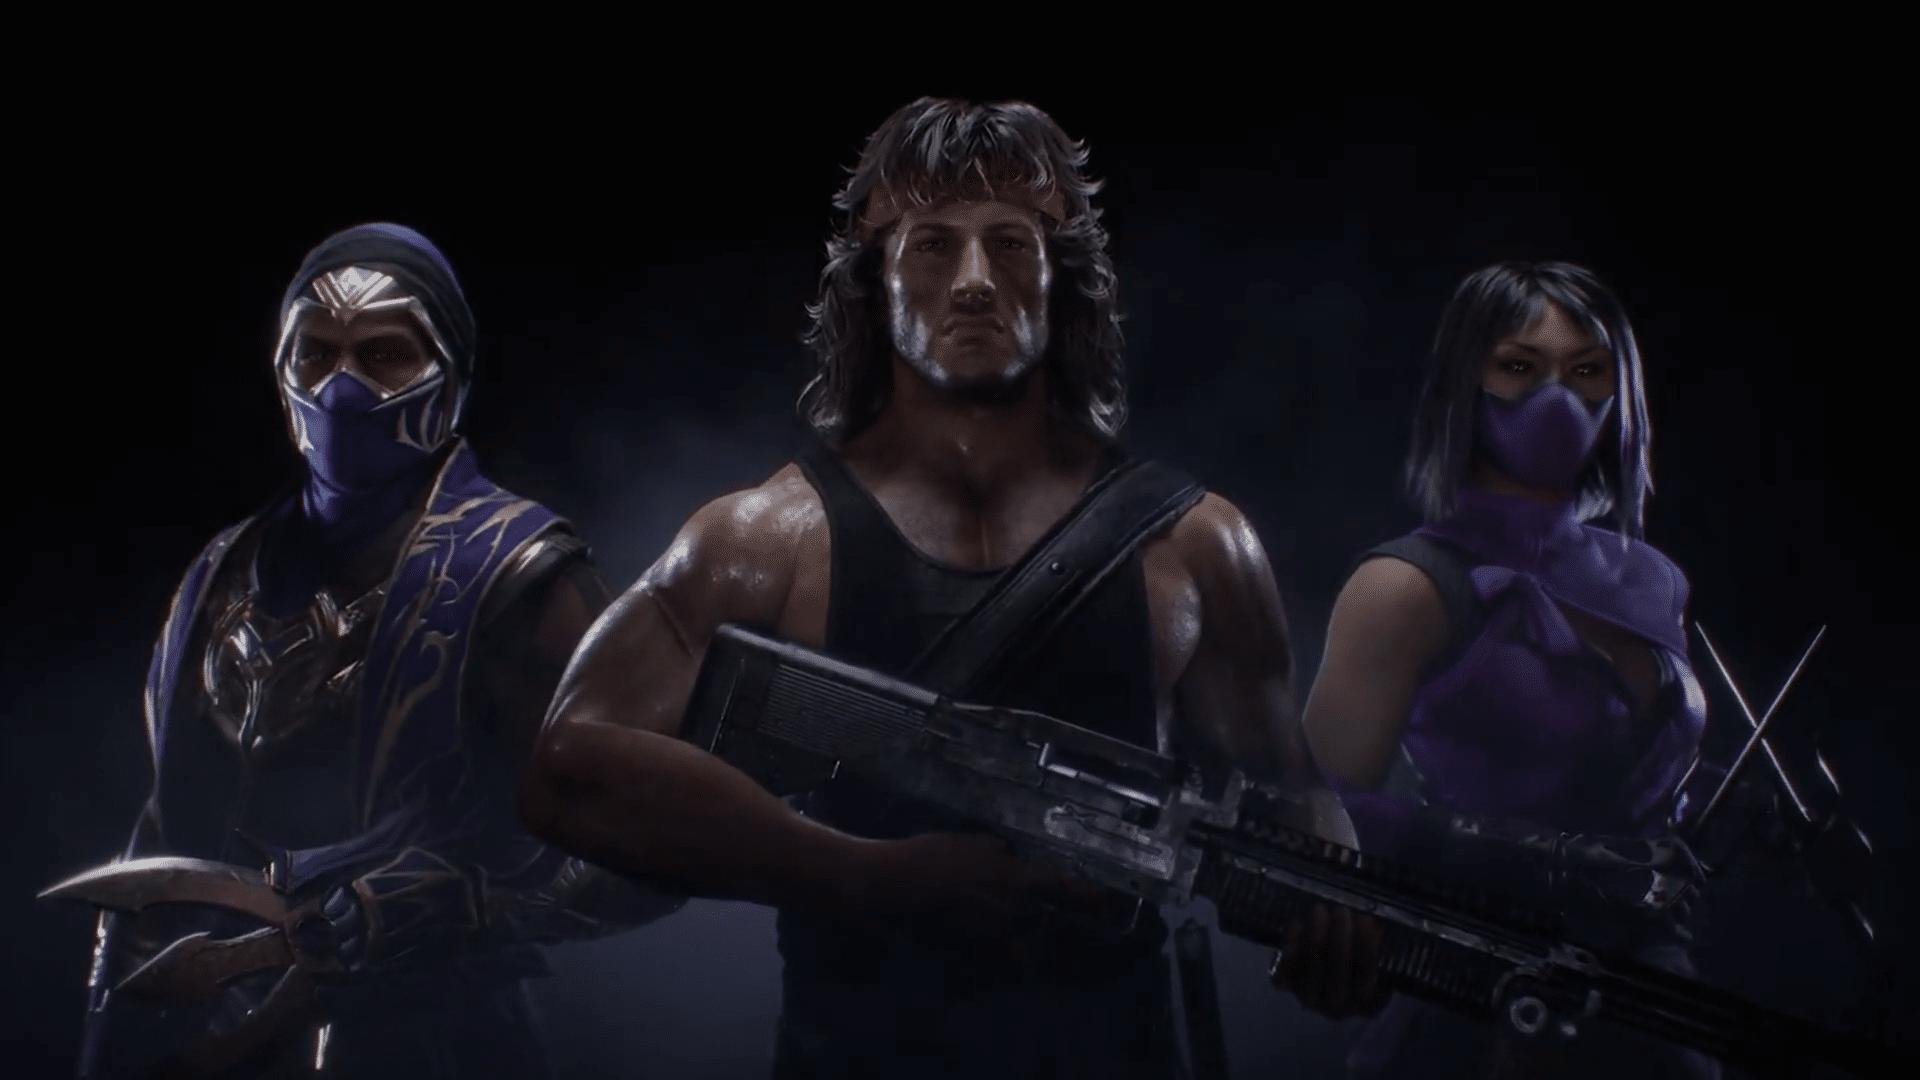 Rain, Mileena, and Rambo Coming To Mortal Kombat 11